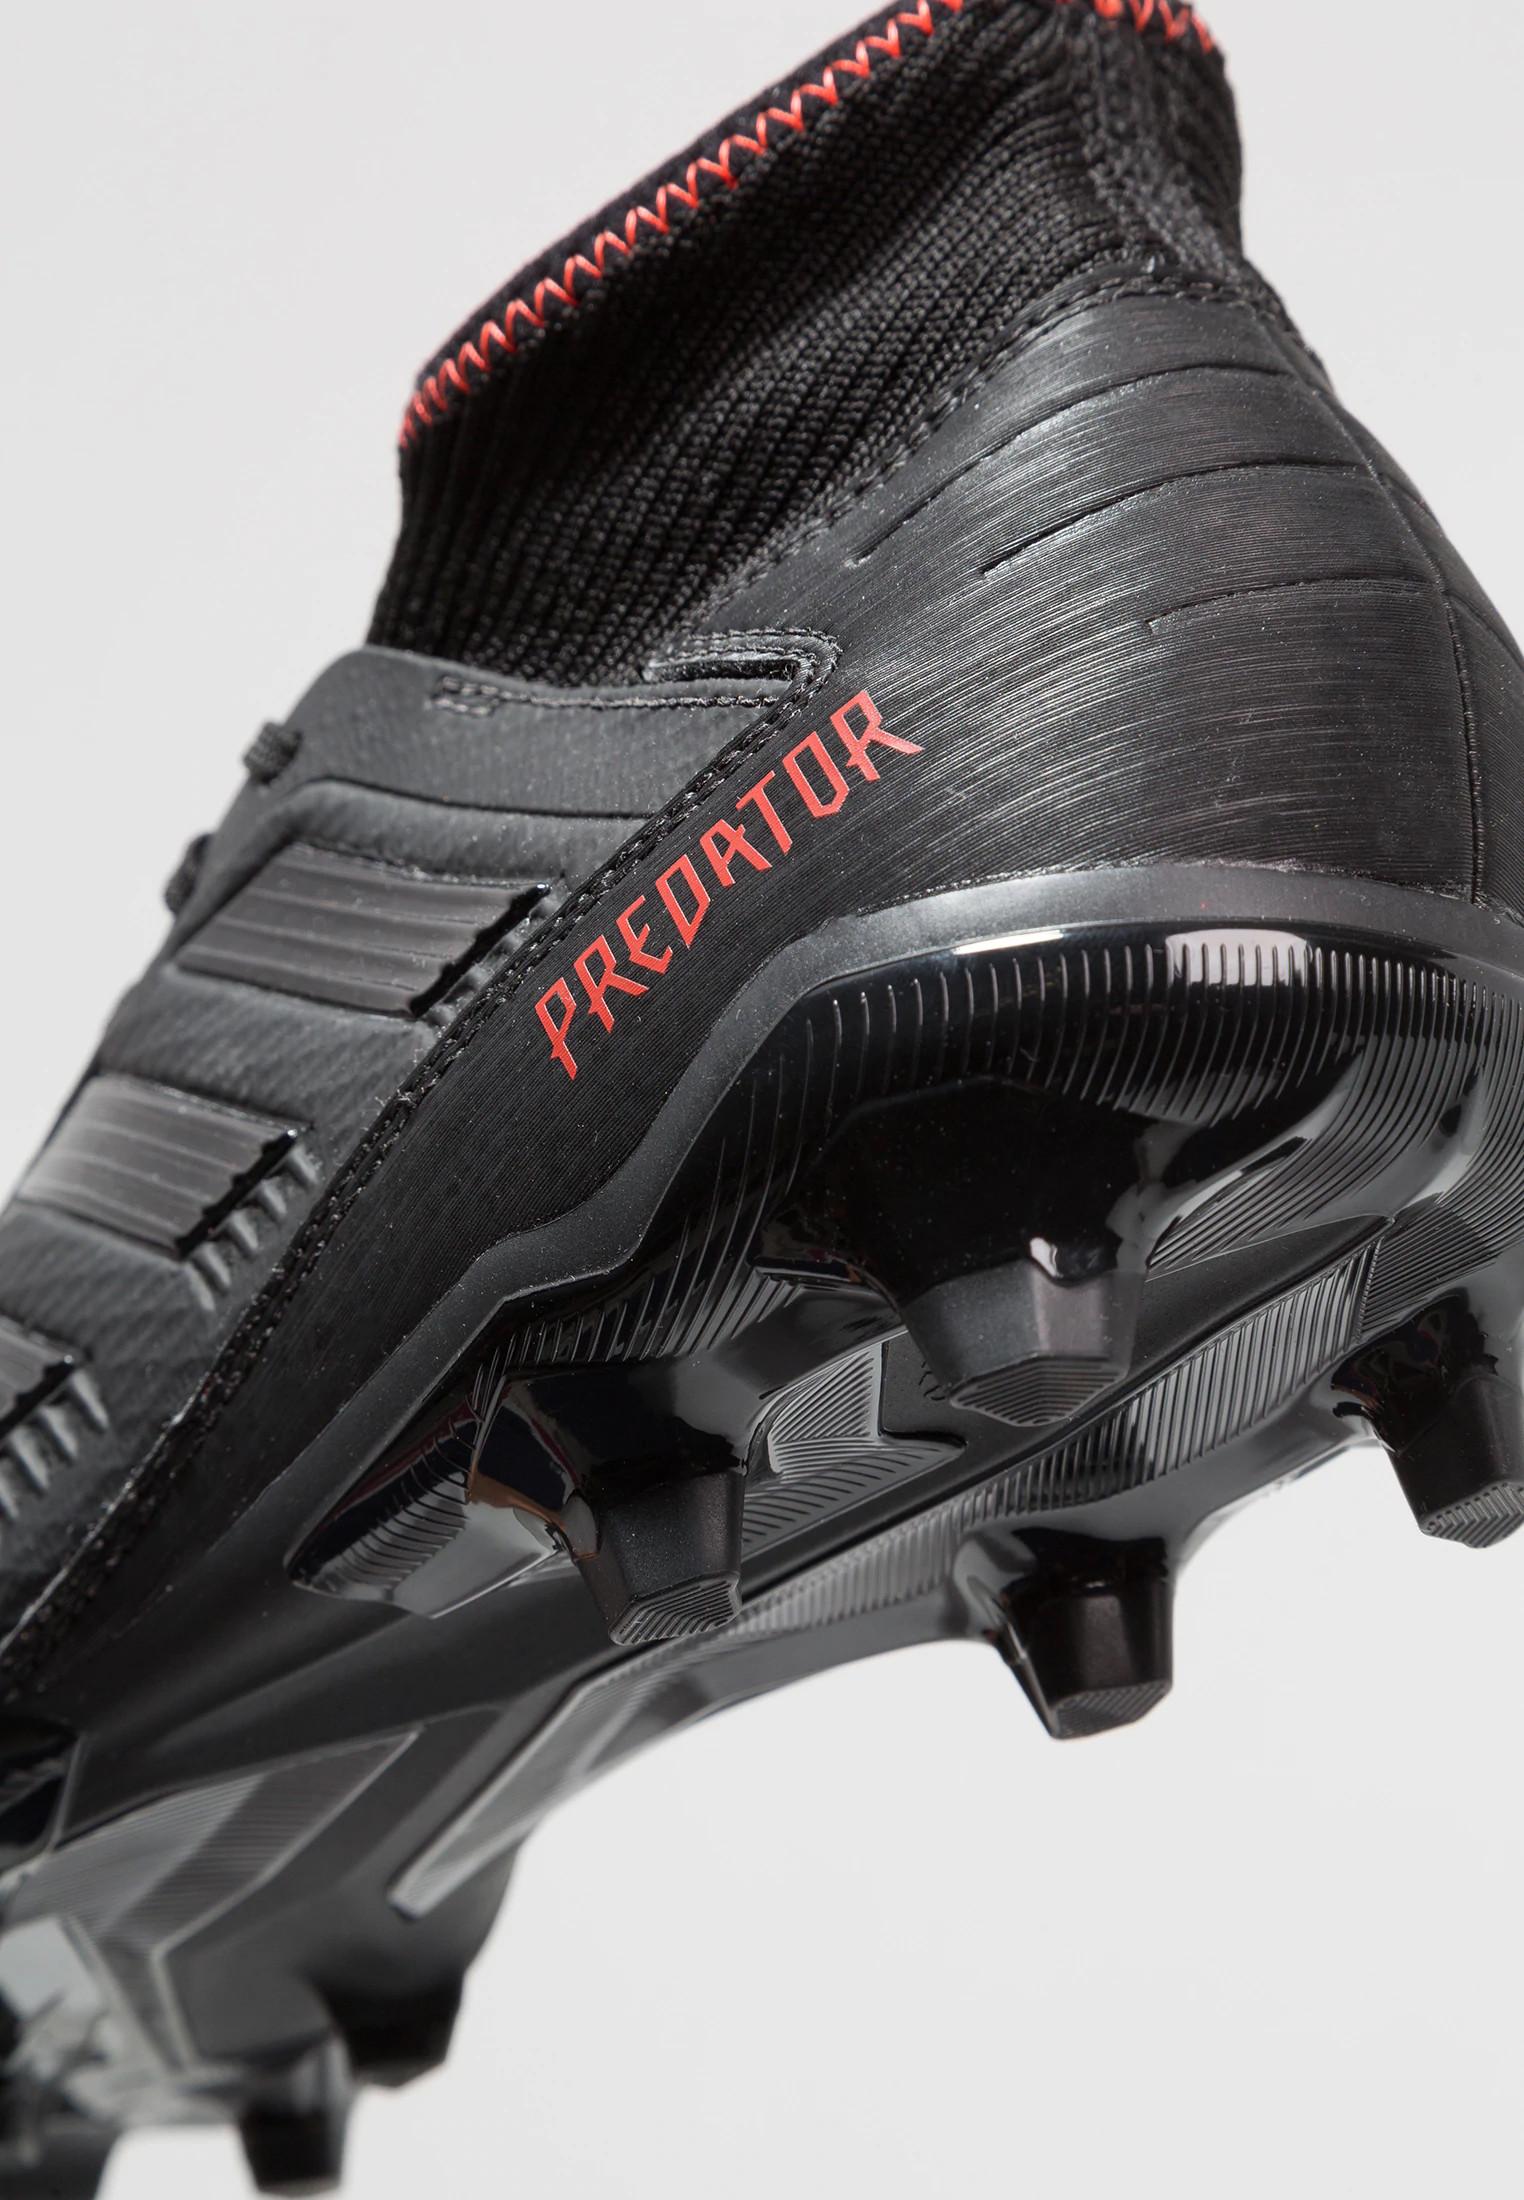 8adbf215d27657 Football boots shoes Adidas Cleats with sock 19.3 FG Boy Predator ...